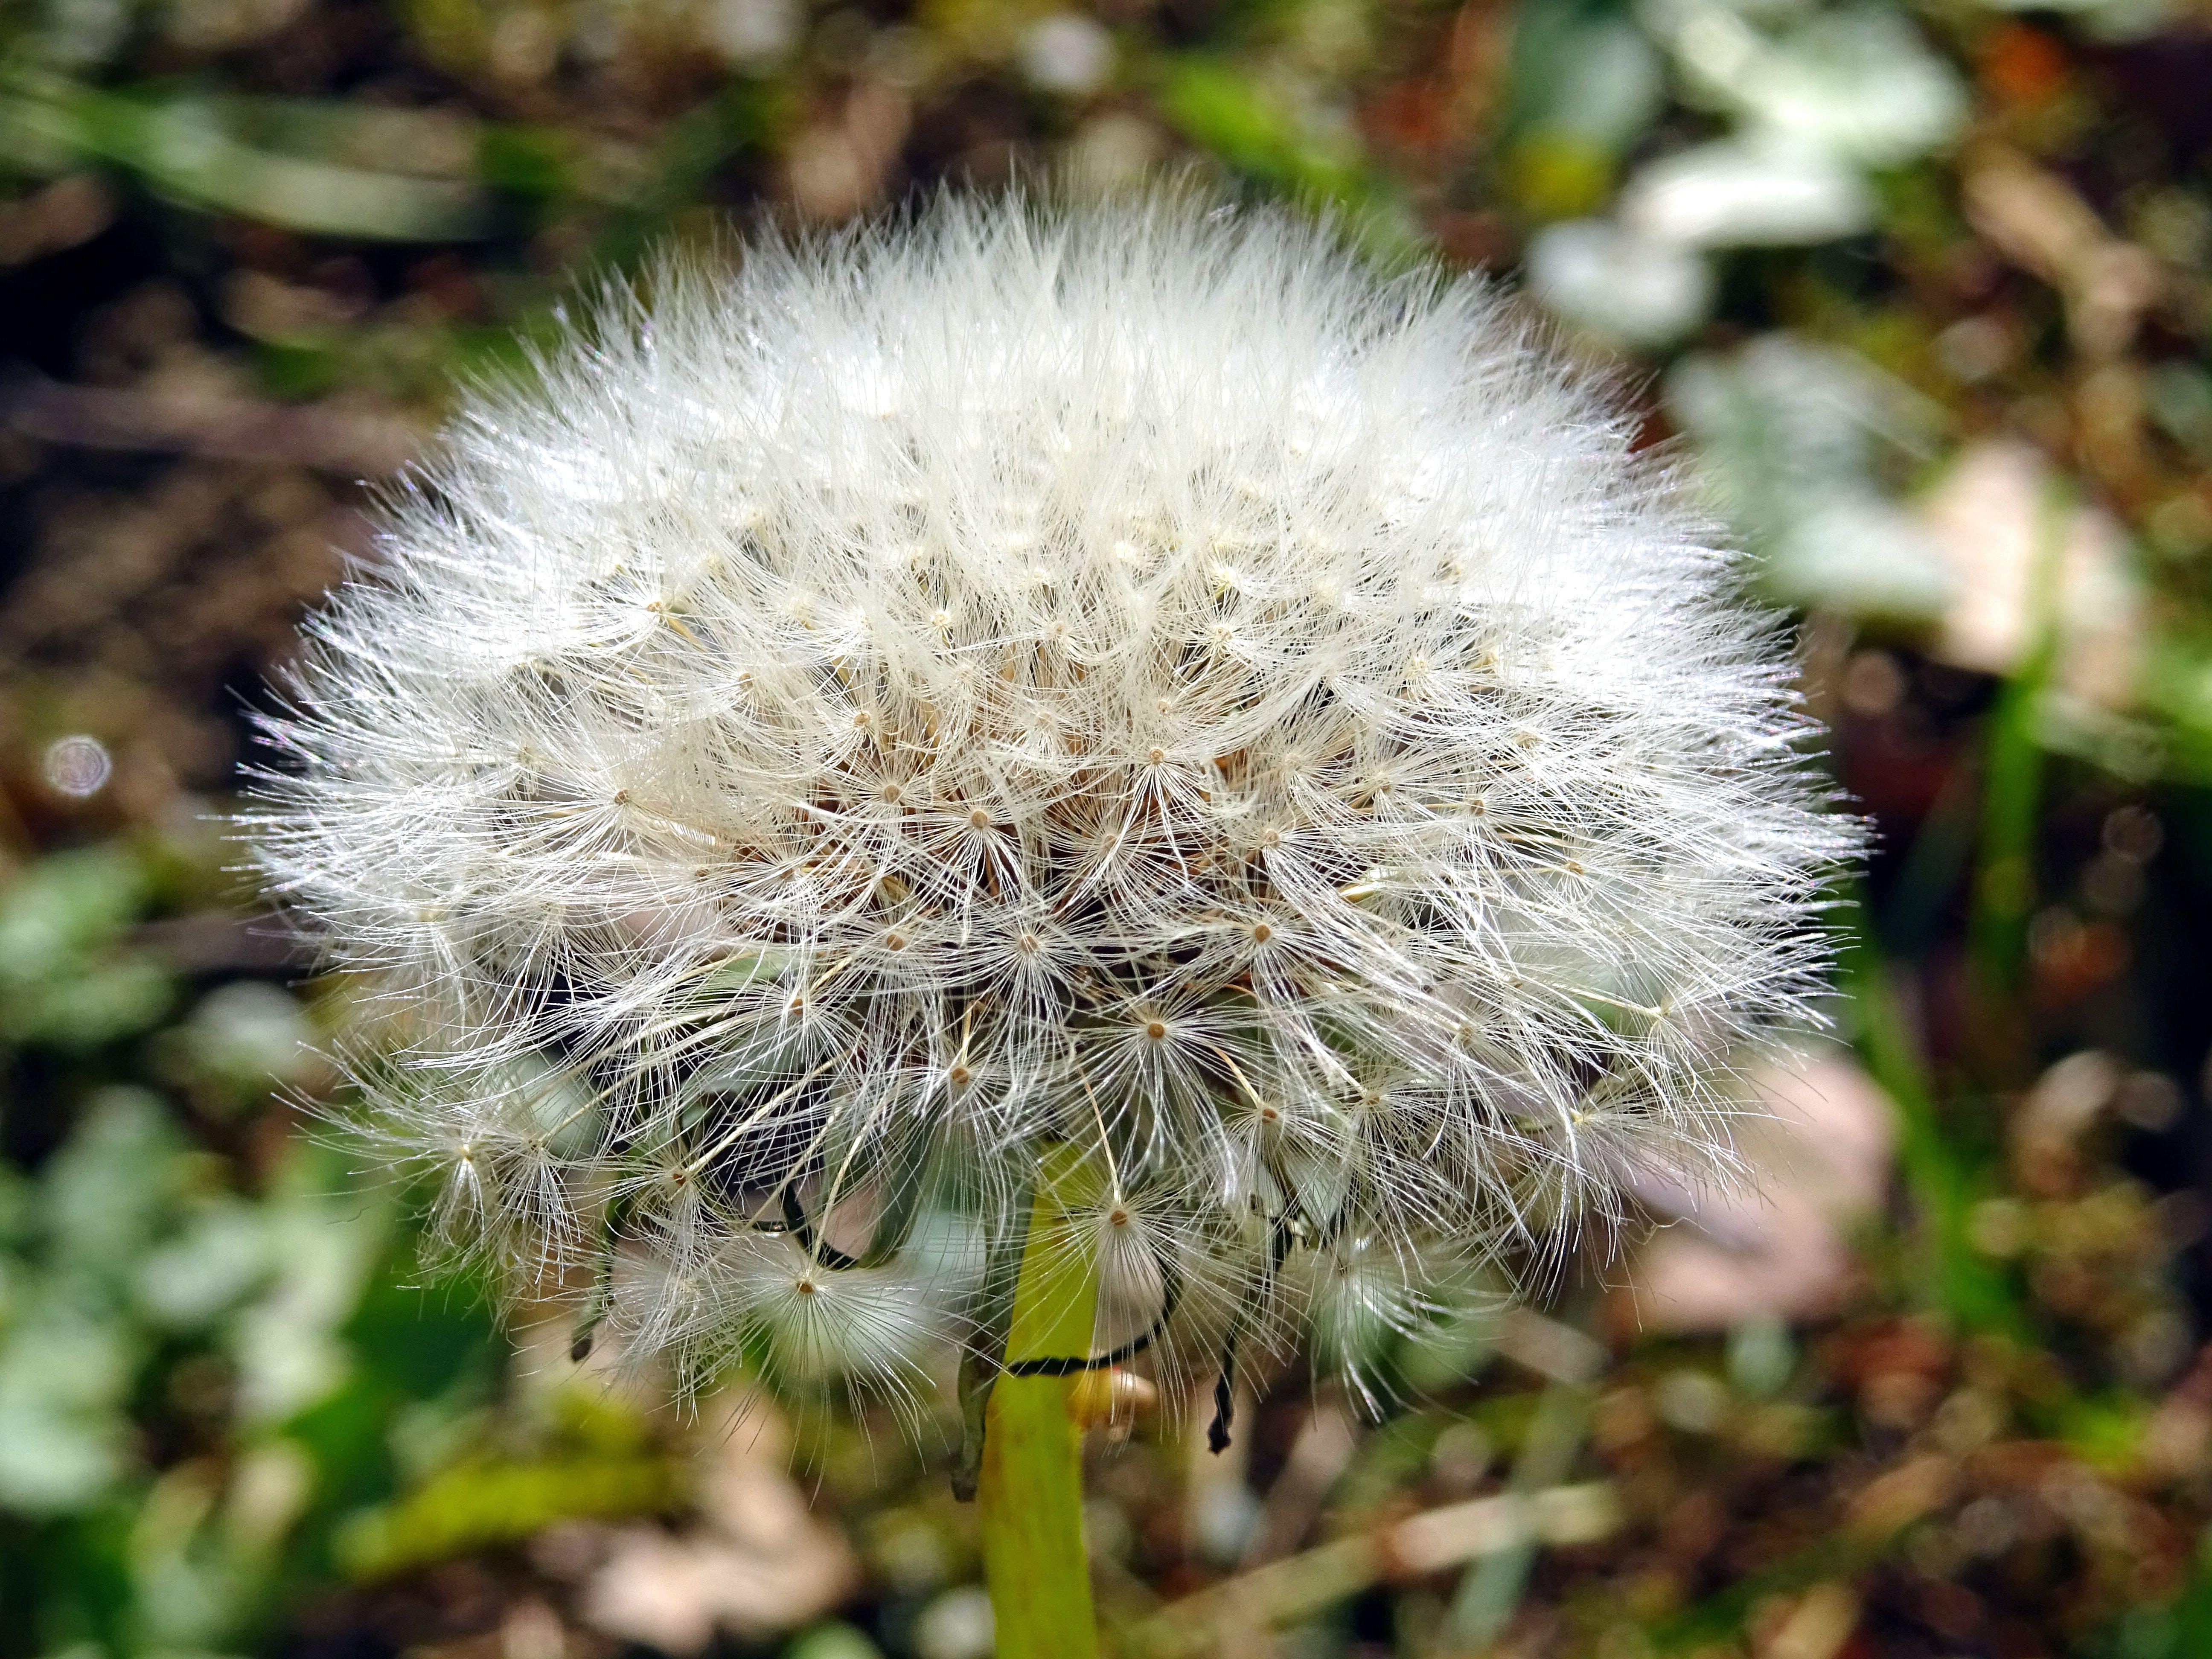 White Dandelion Closeup Photo